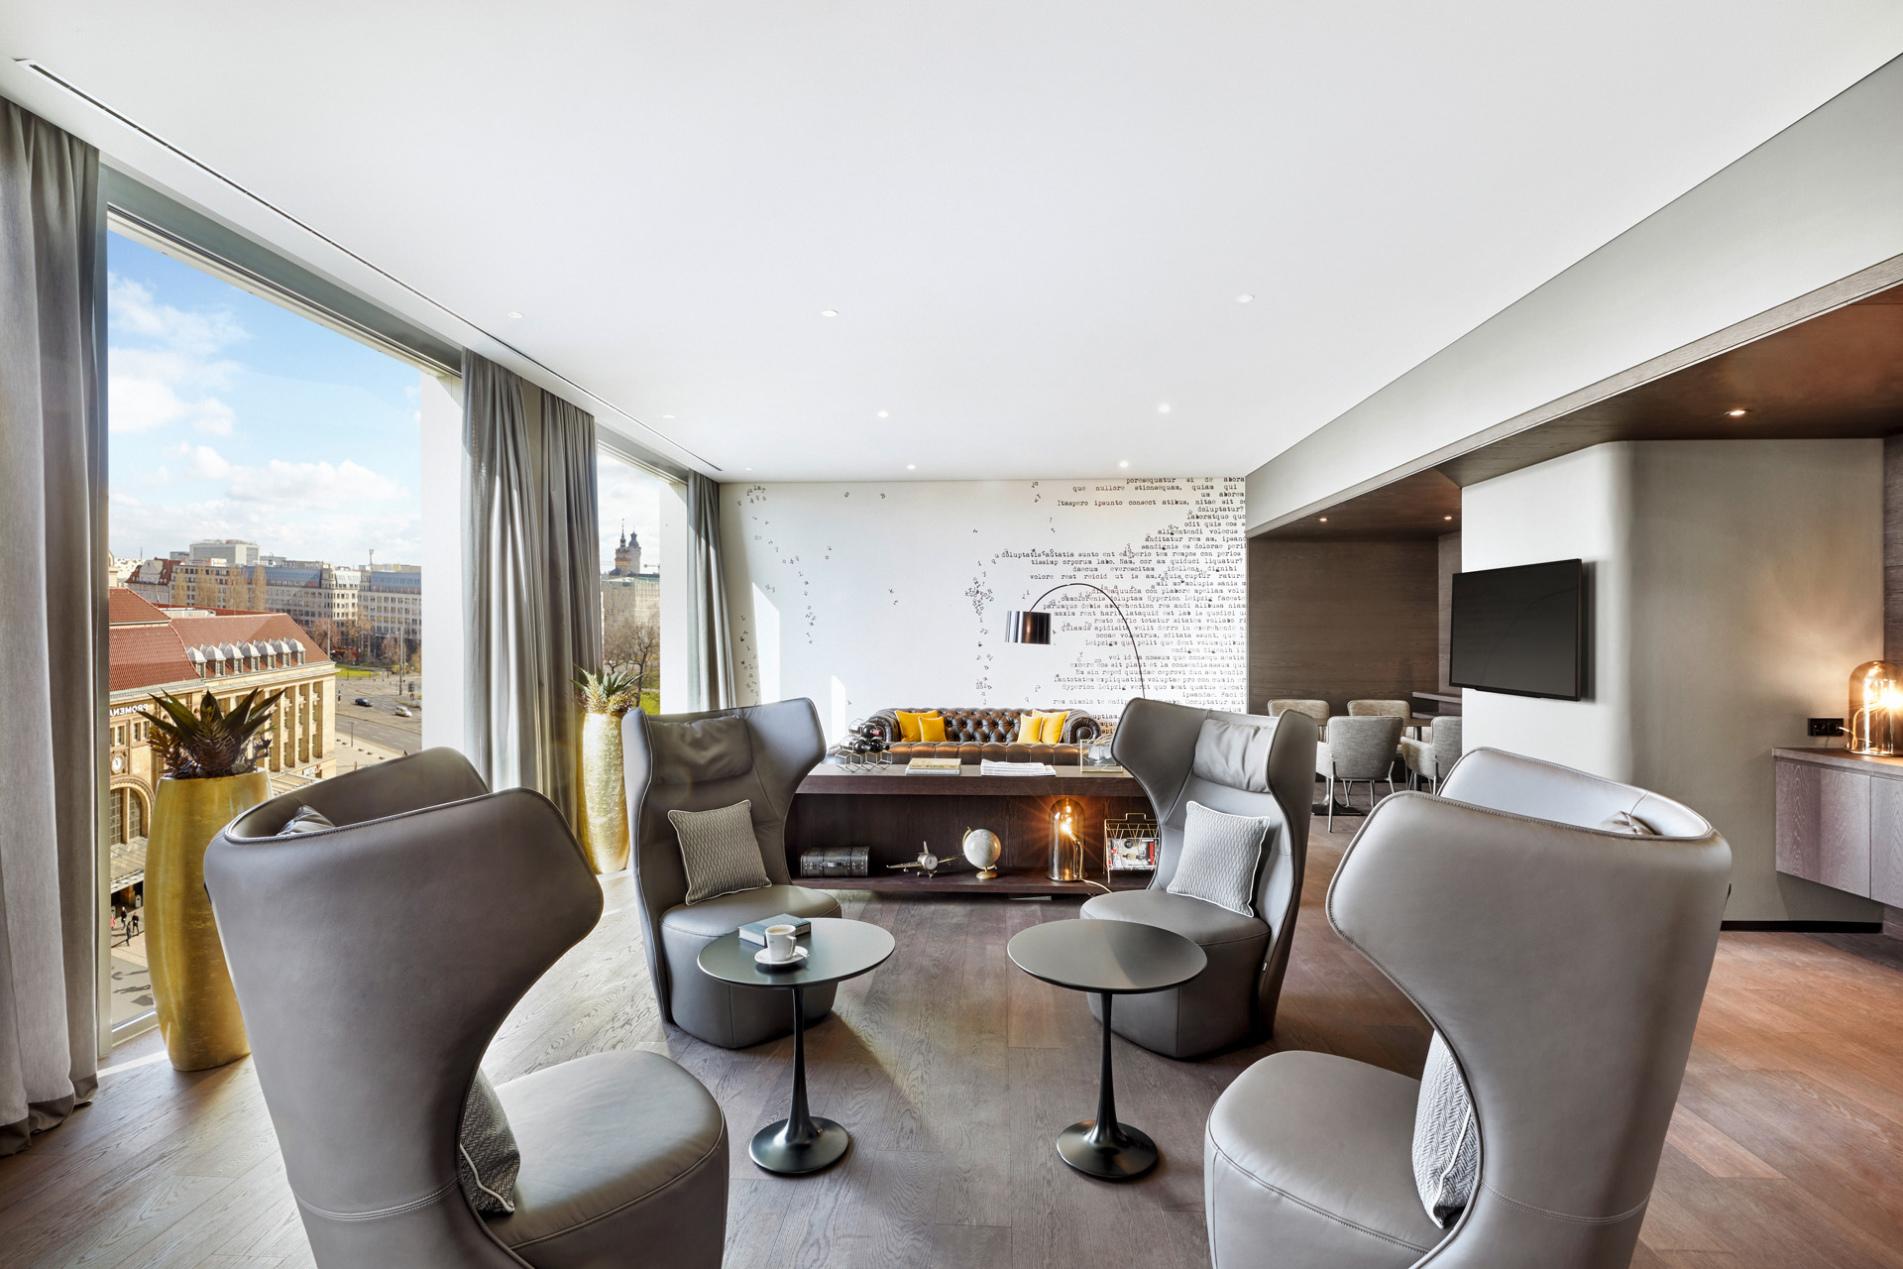 H Hotels Executive Lounge 03 Hyperion Hotel Leipzig Original (kommerz